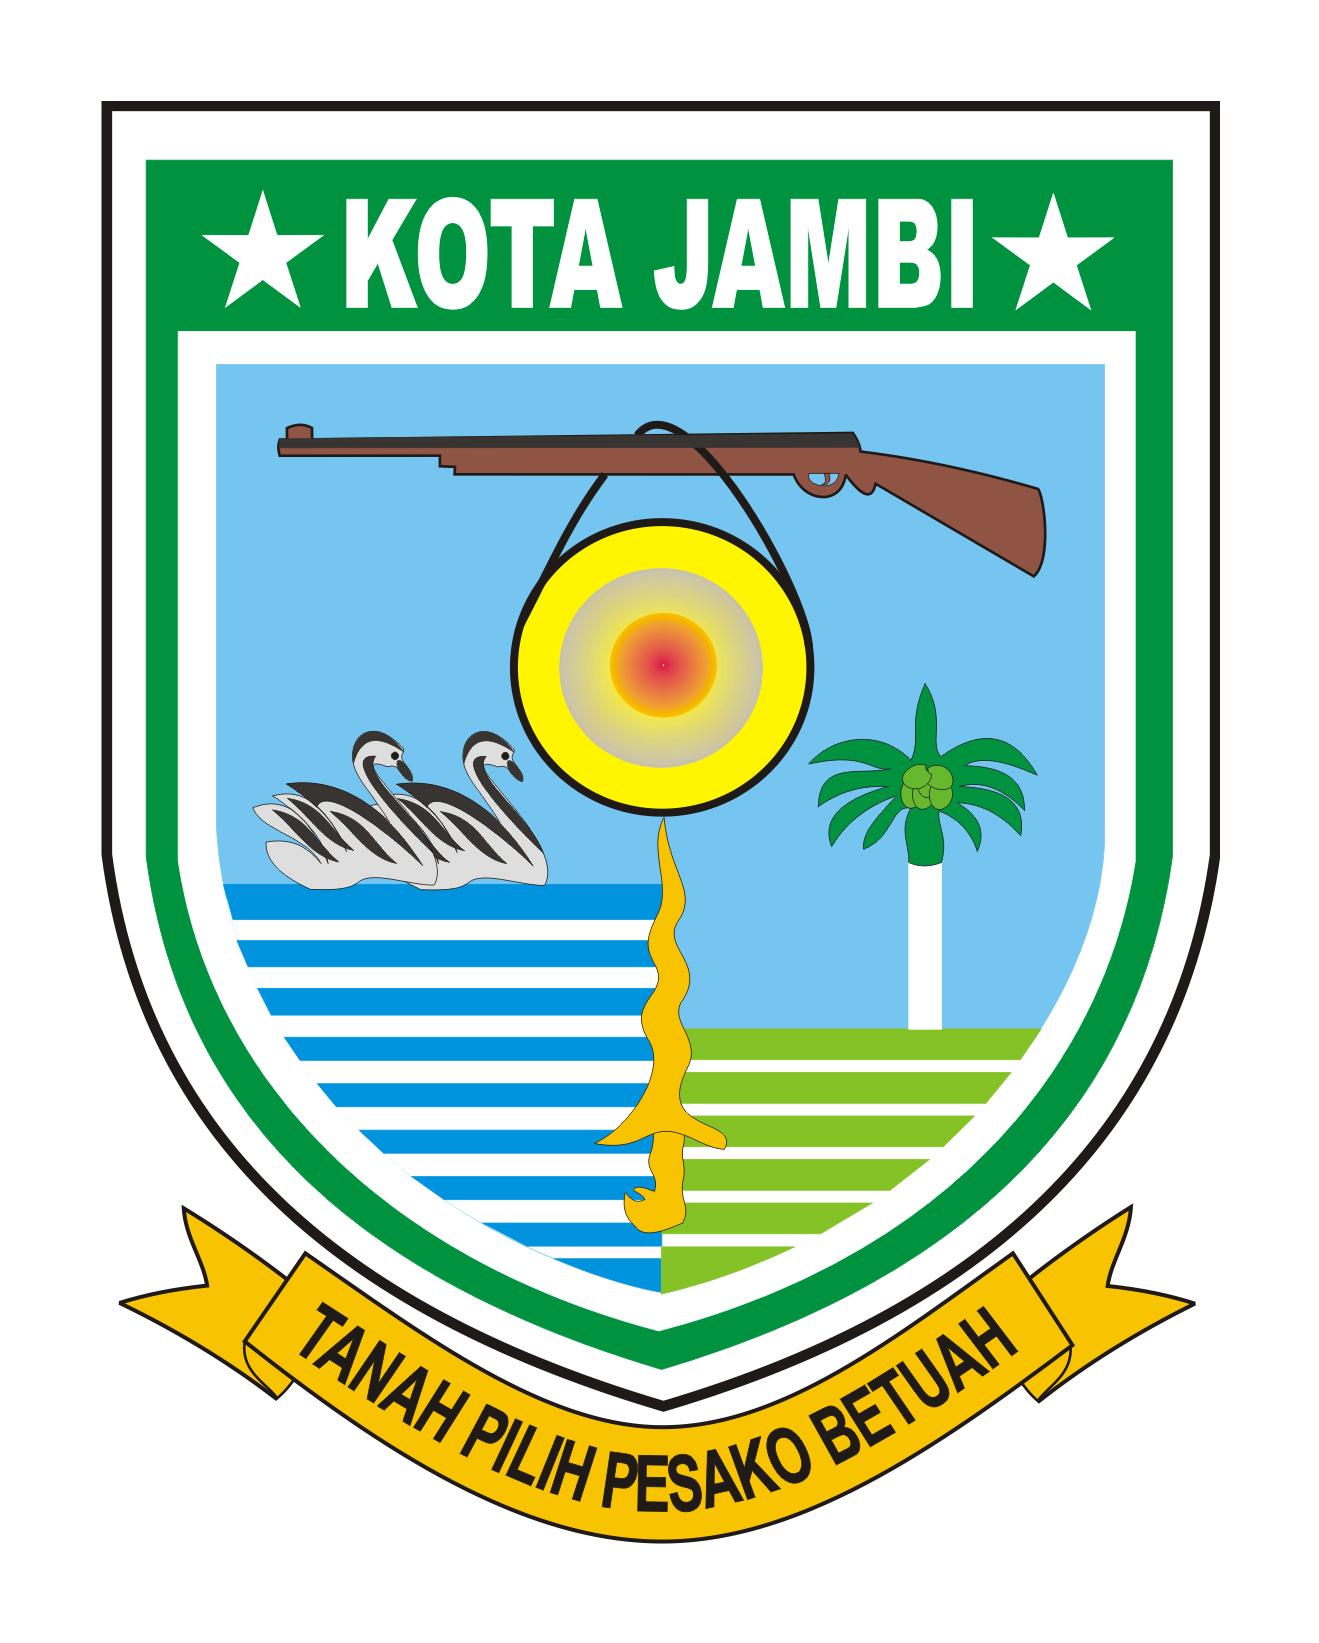 Logo Kota Jambi (Ibu Kota Provinsi Jambi) Original